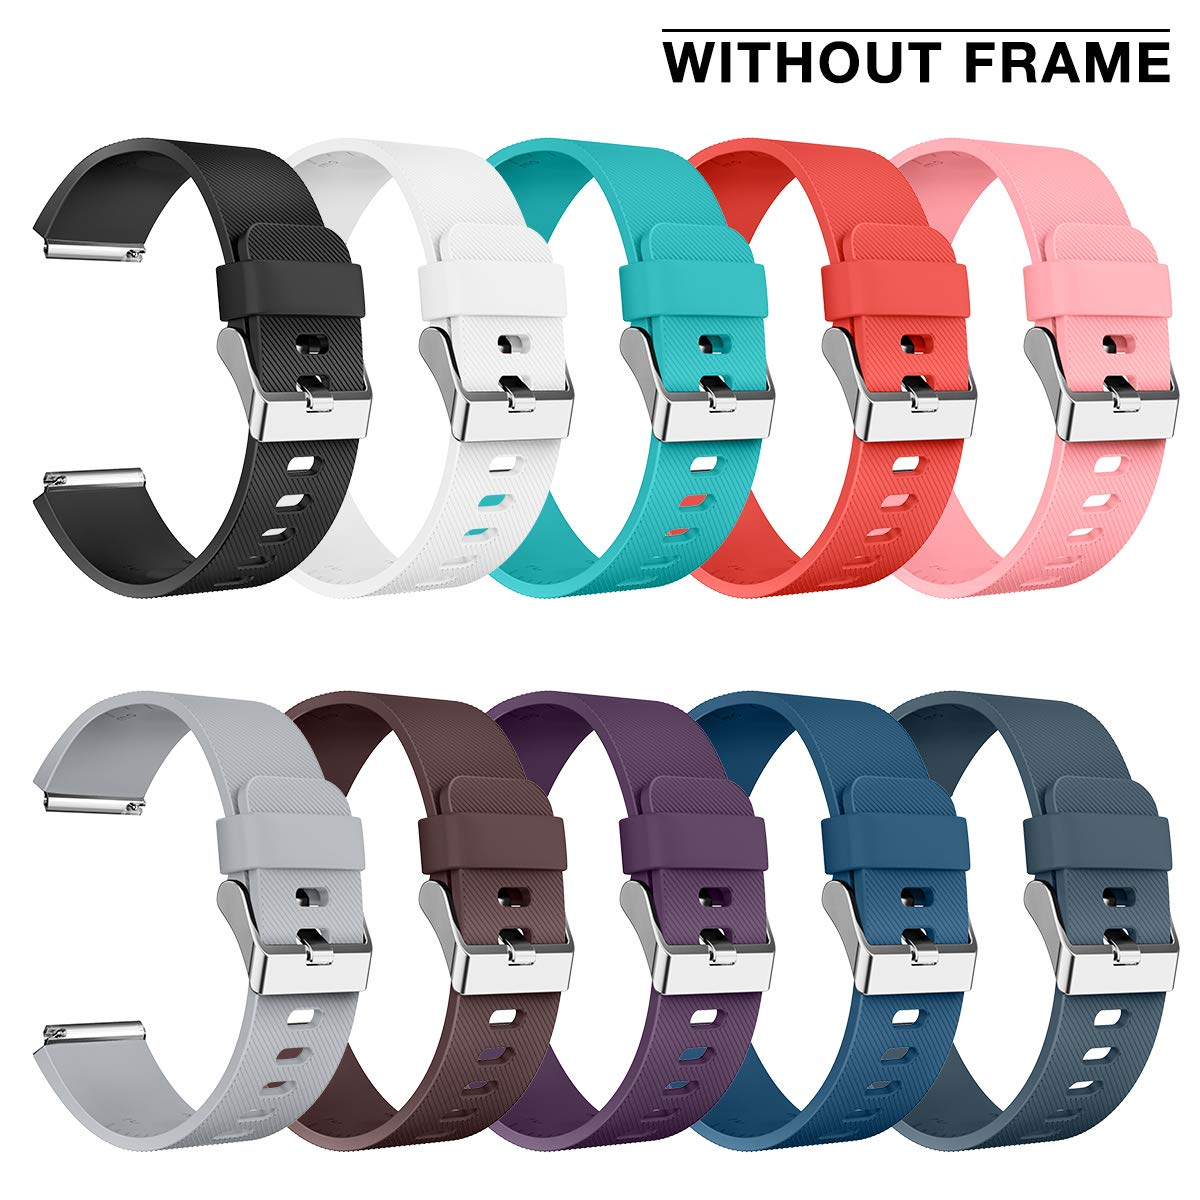 AIUNIT Compatible Fitbit Blaze Bands Small, Replacement for Fitbit Blaze Accessories Wristband Watch Sport Strap for Fitbit Blaze Smart Tracker Women Men Teends Stripe Texture 10 Pack No Tracker